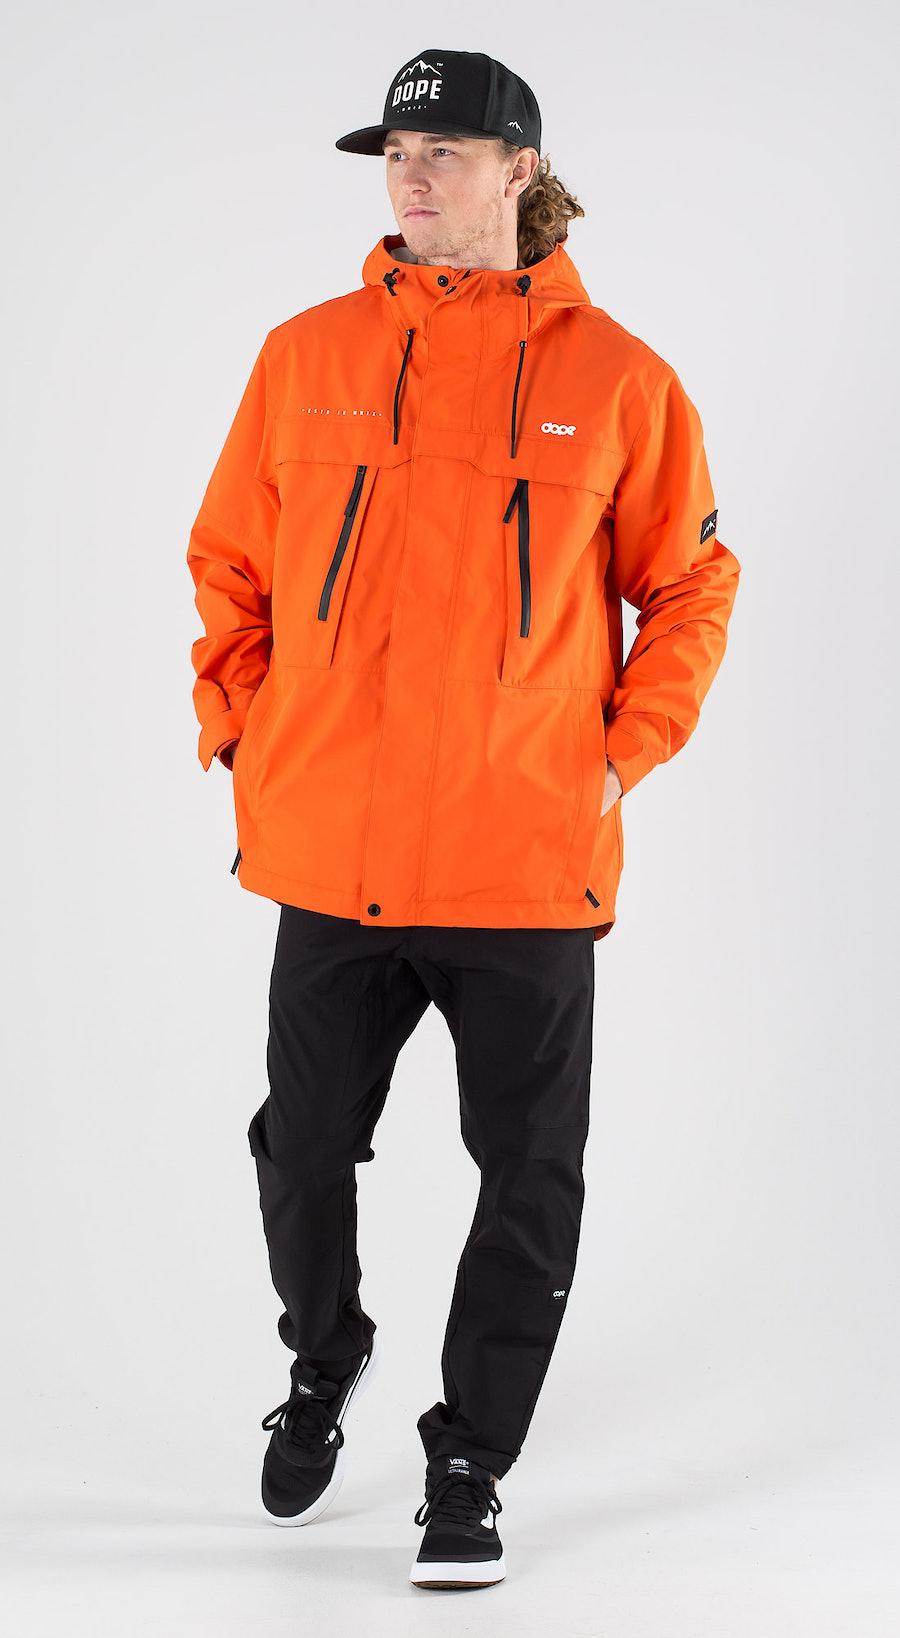 Dope Trekker Orange Outfit Multi